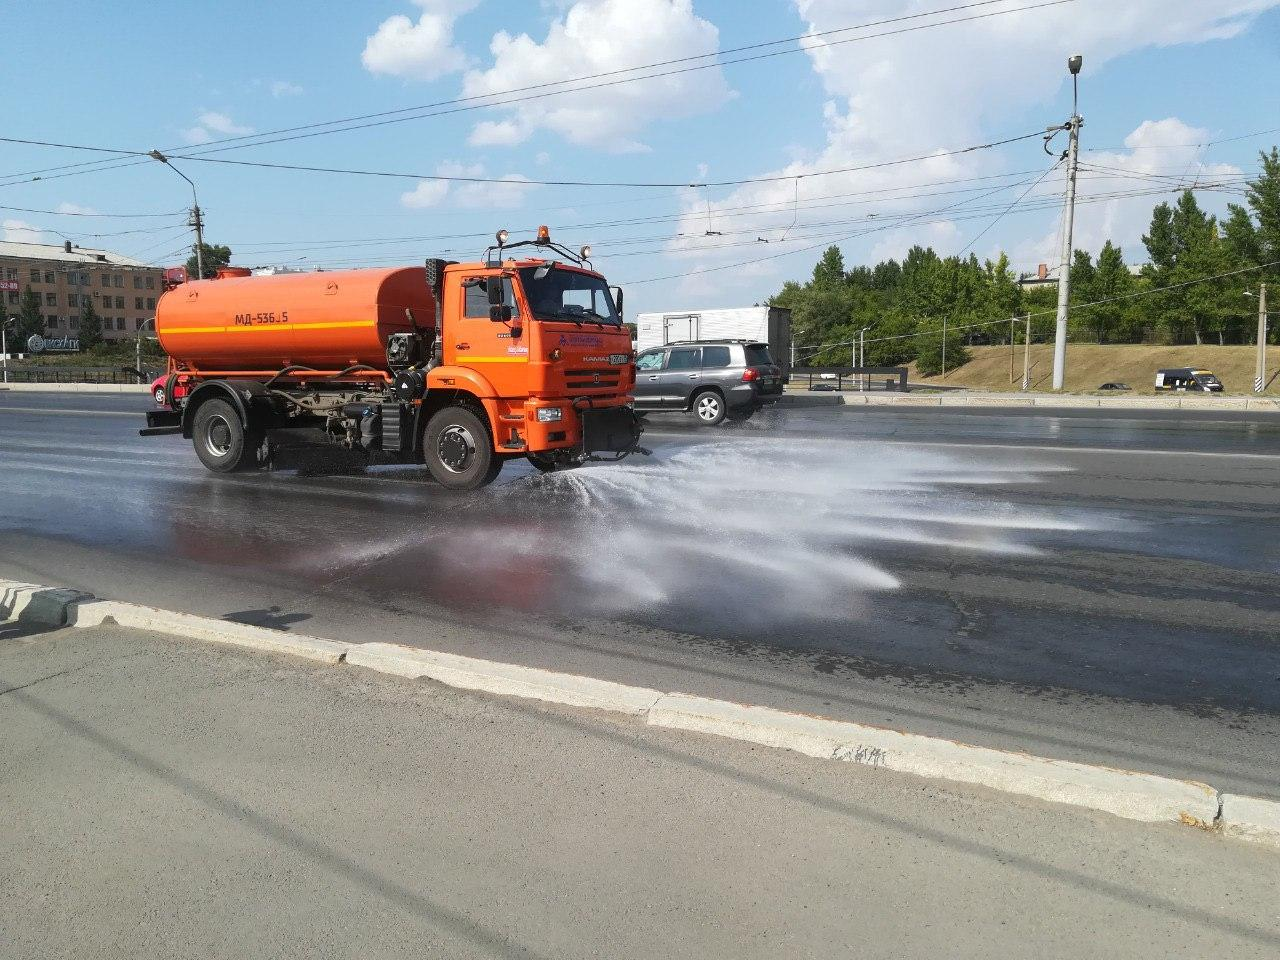 Дороги в Омске активно поливают в жару #Новости #Общество #Омск